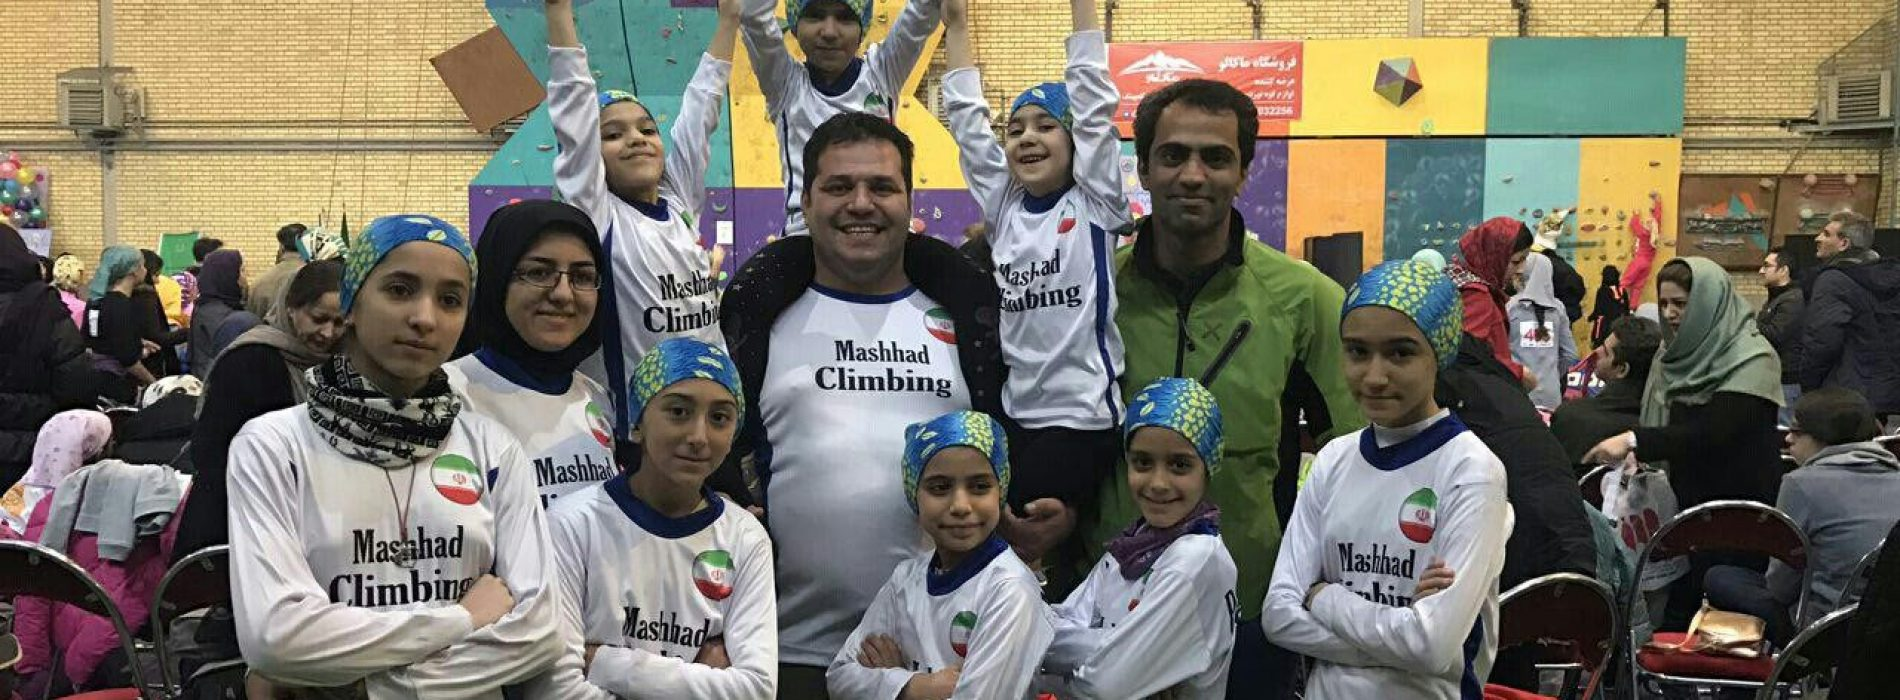 مسابقه عکس «راتا» جام فجر سنگنوردی نونهالان و نوجوانان